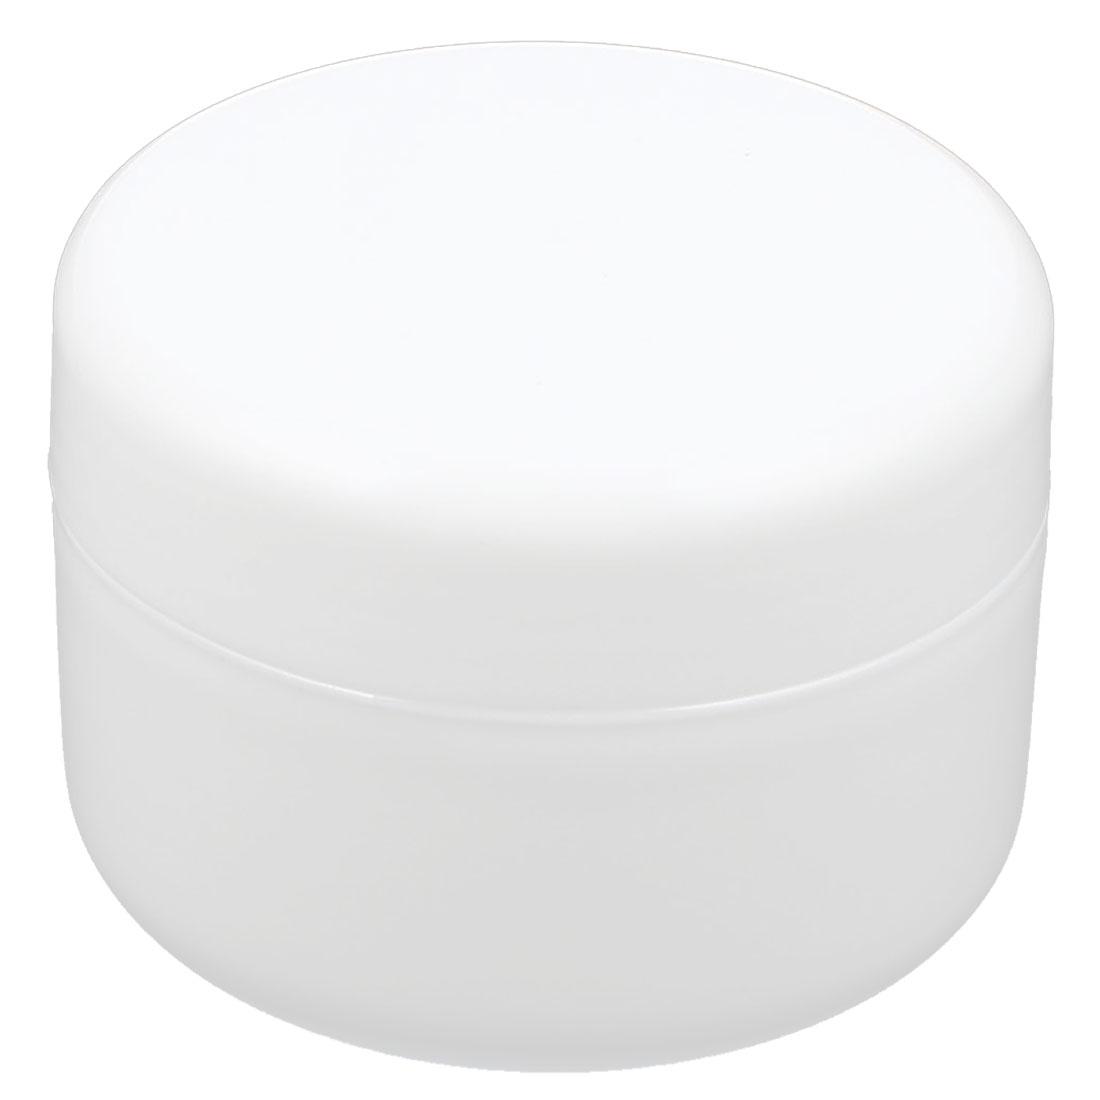 White Plastic Makeup Cosmetic Empty Jar Pot Face Cream Eyeshadow Moisturizer Bottle Holder 100g